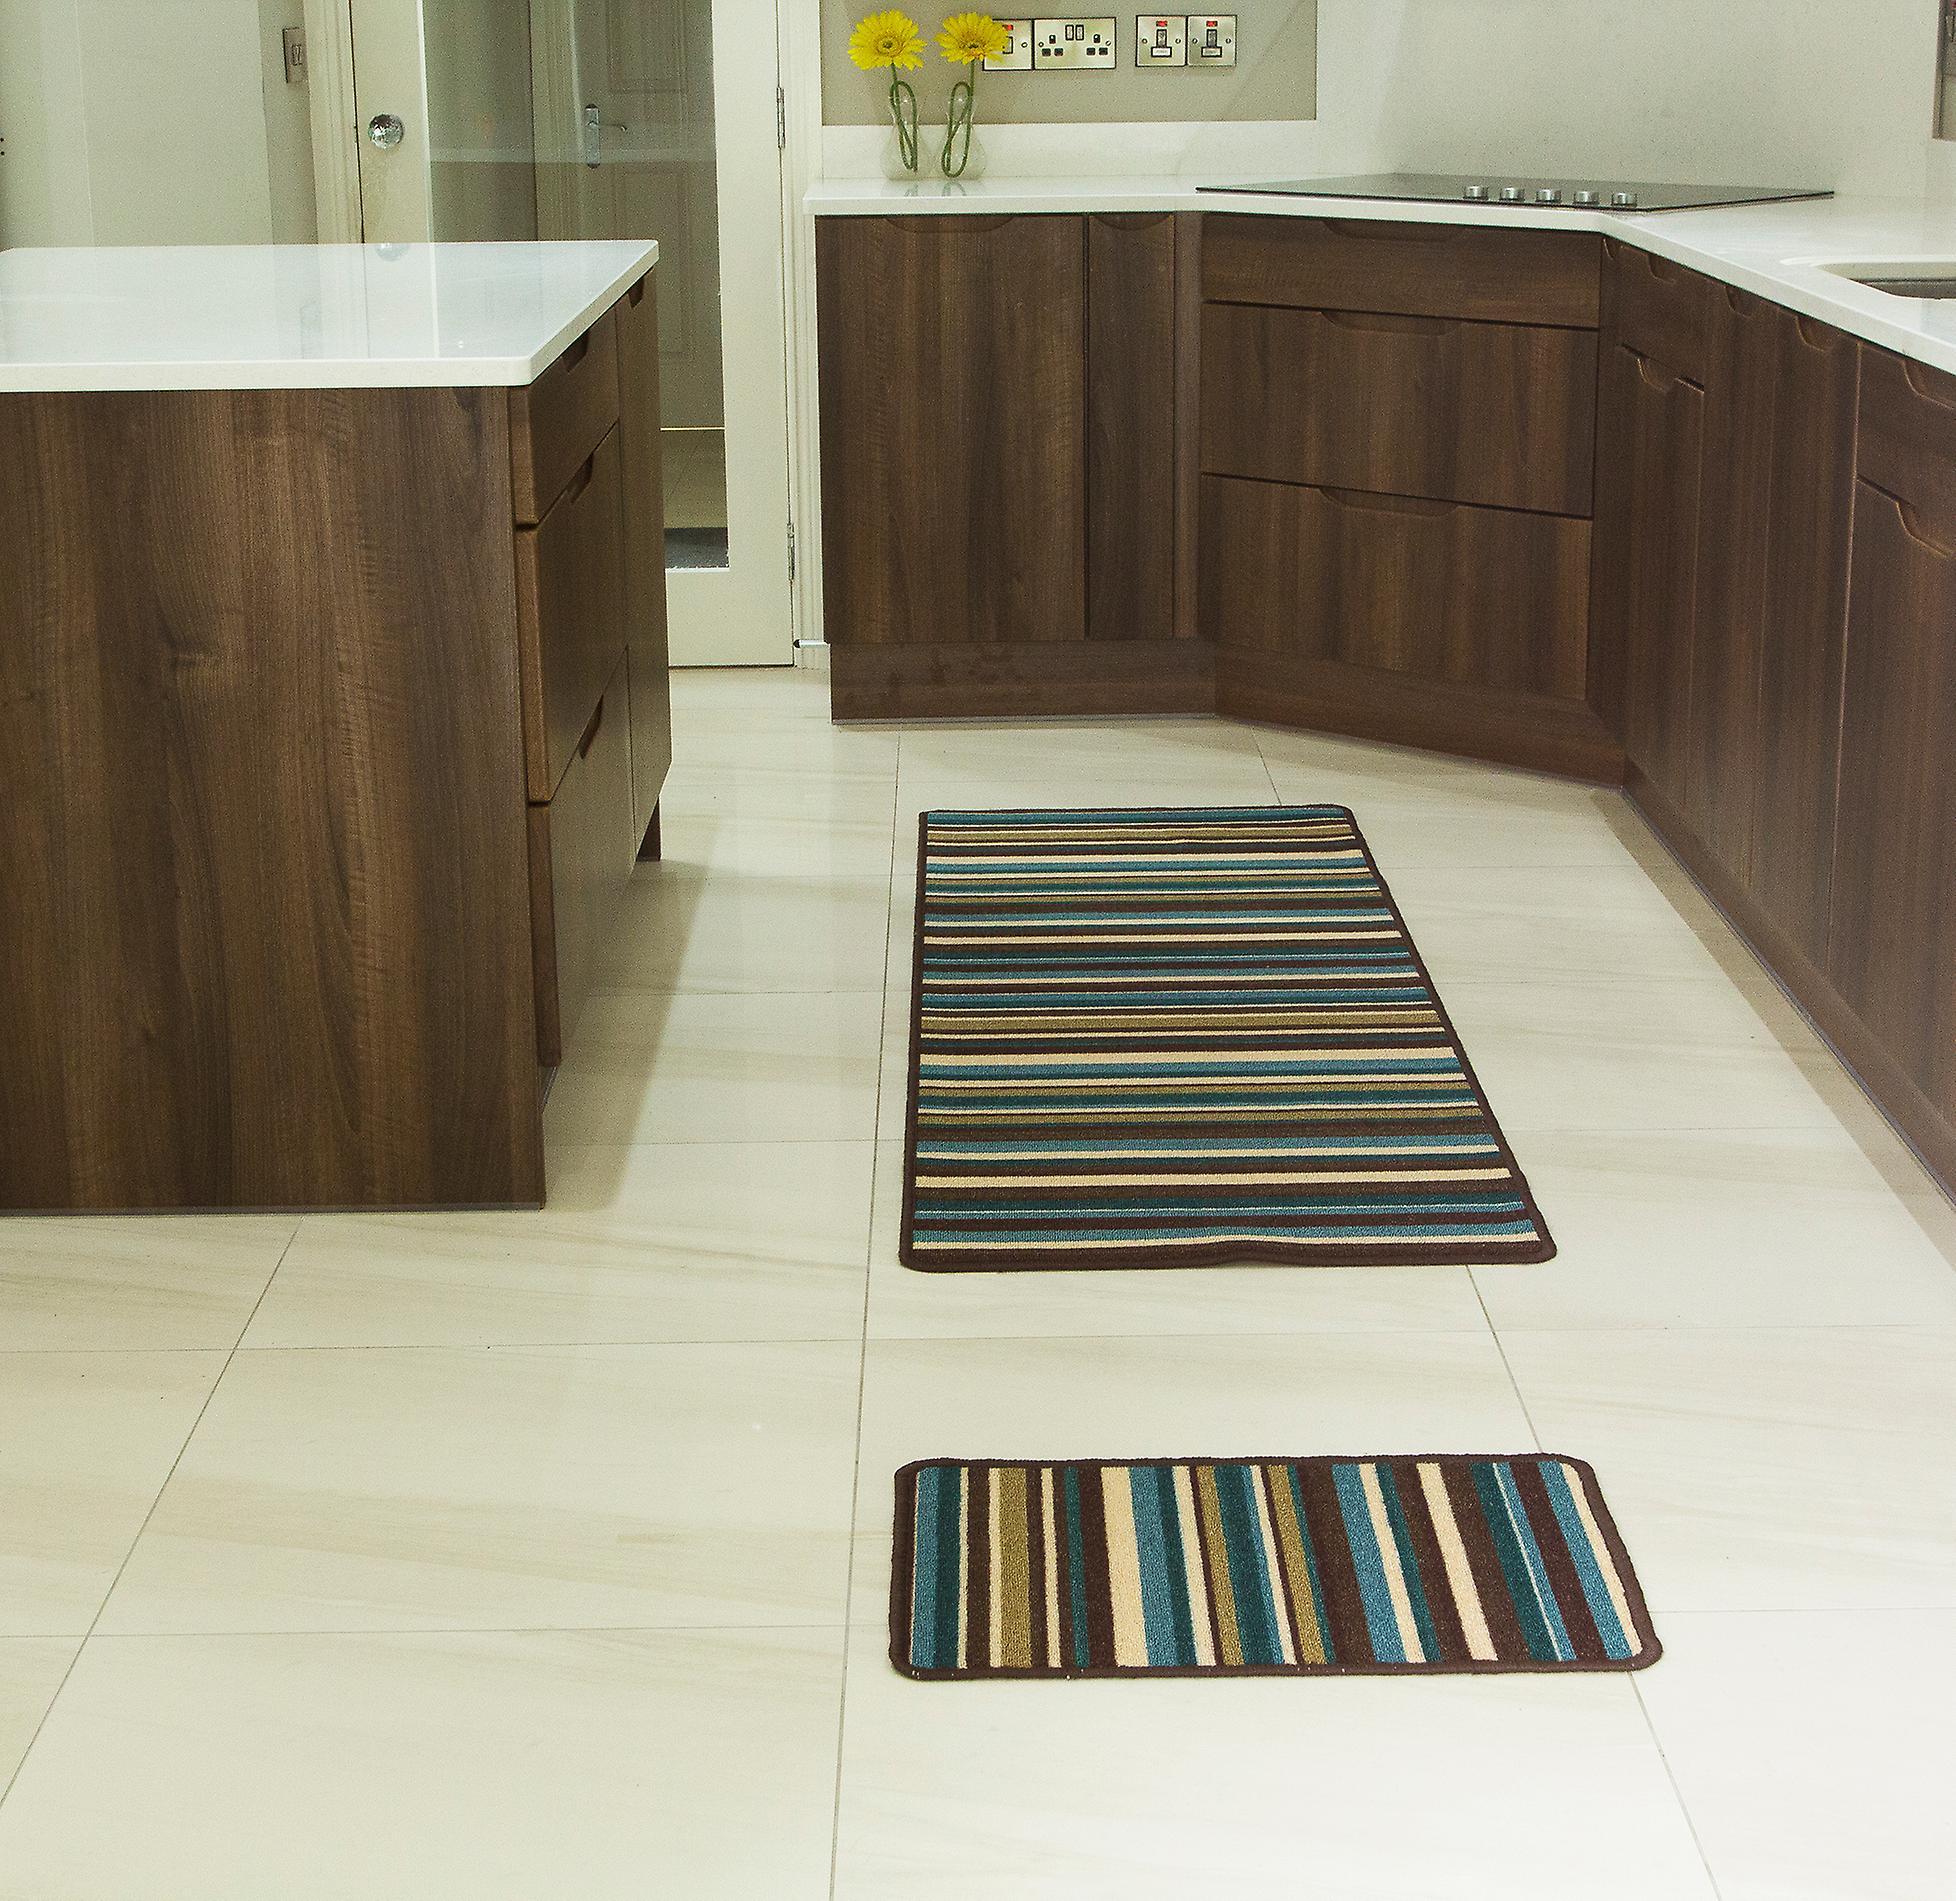 petrol blau flur l ufer teppich luna fruugo. Black Bedroom Furniture Sets. Home Design Ideas